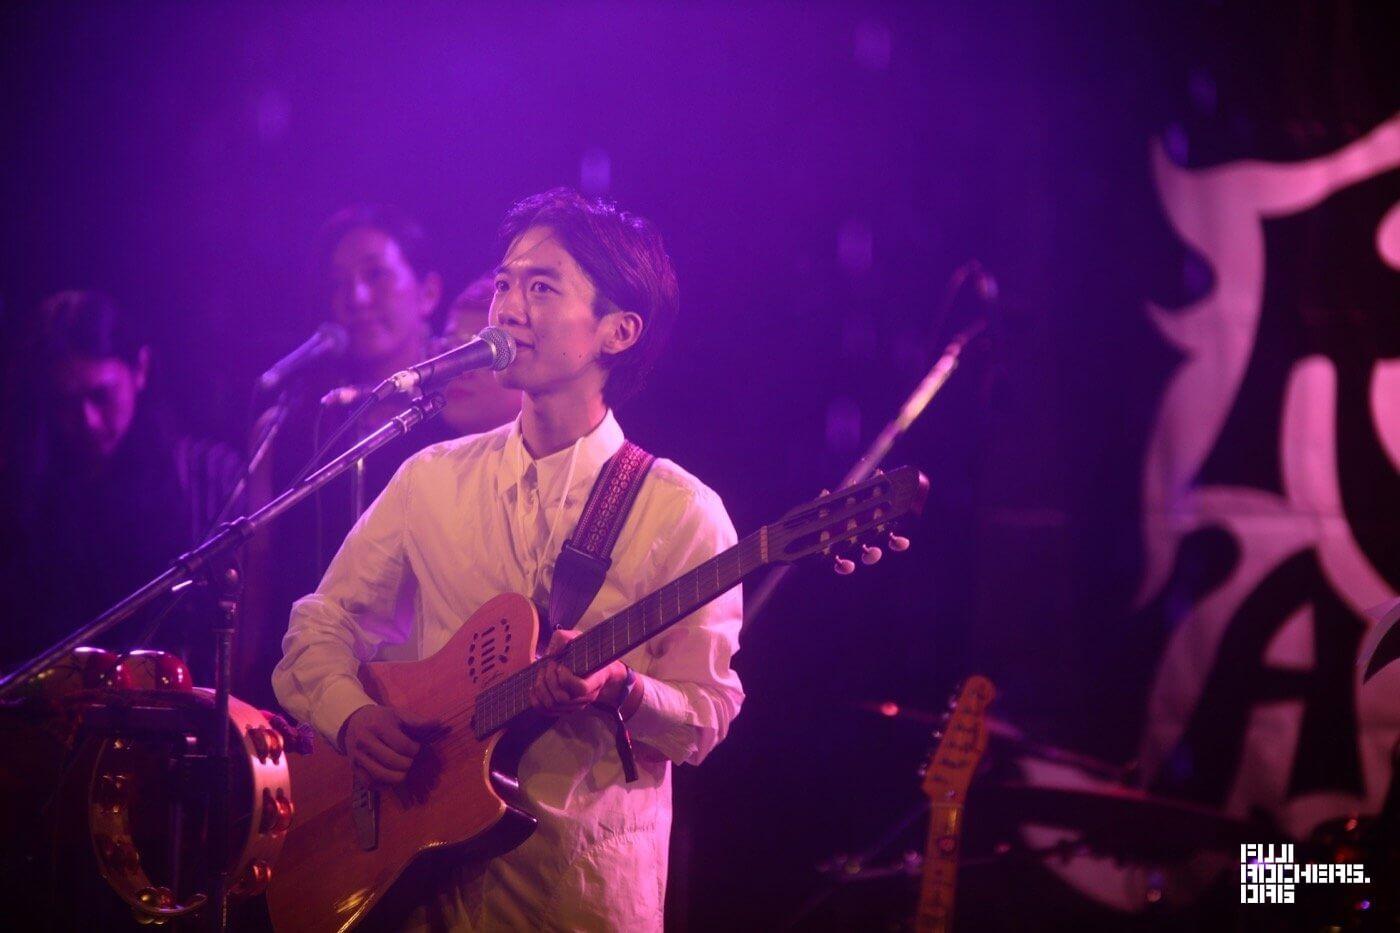 Morinaga Akimi & il paradiso